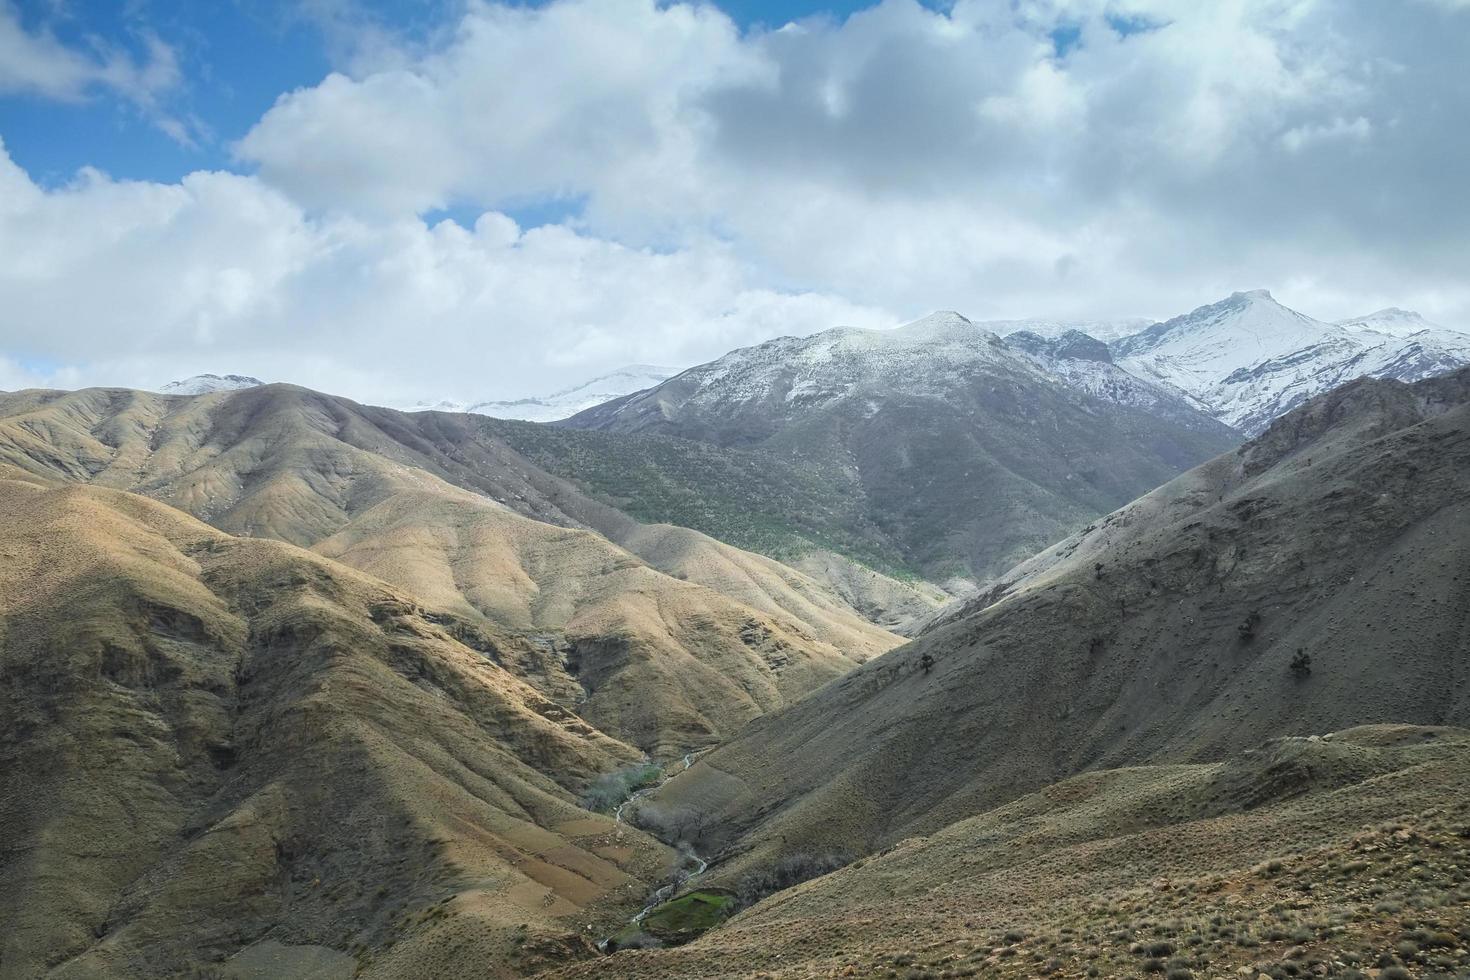 landschaps mening van atlasbergketen tegen bewolkte hemel foto